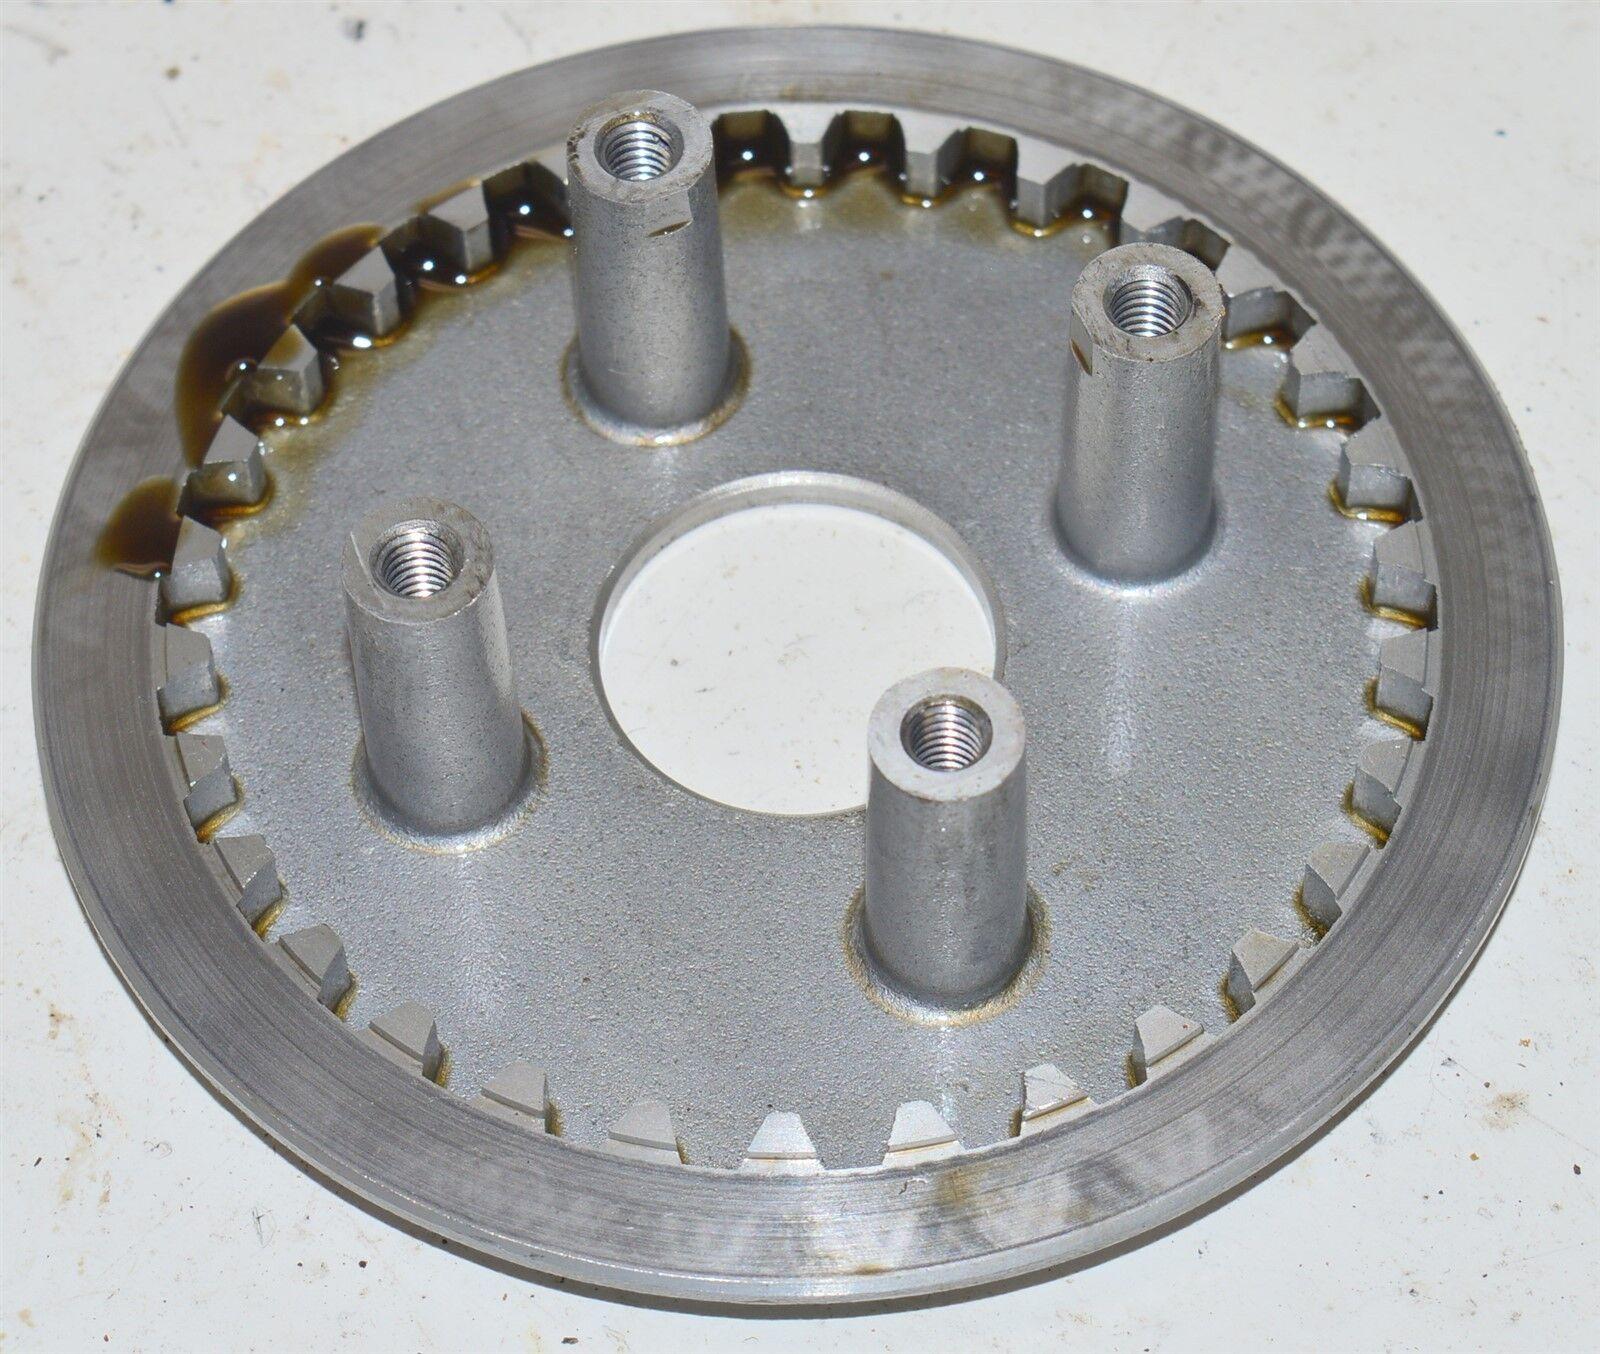 SUZUKI QUADRUNNER 230  LT 230 CLUTCH INNER PRESSURE PLATE 21462-24501